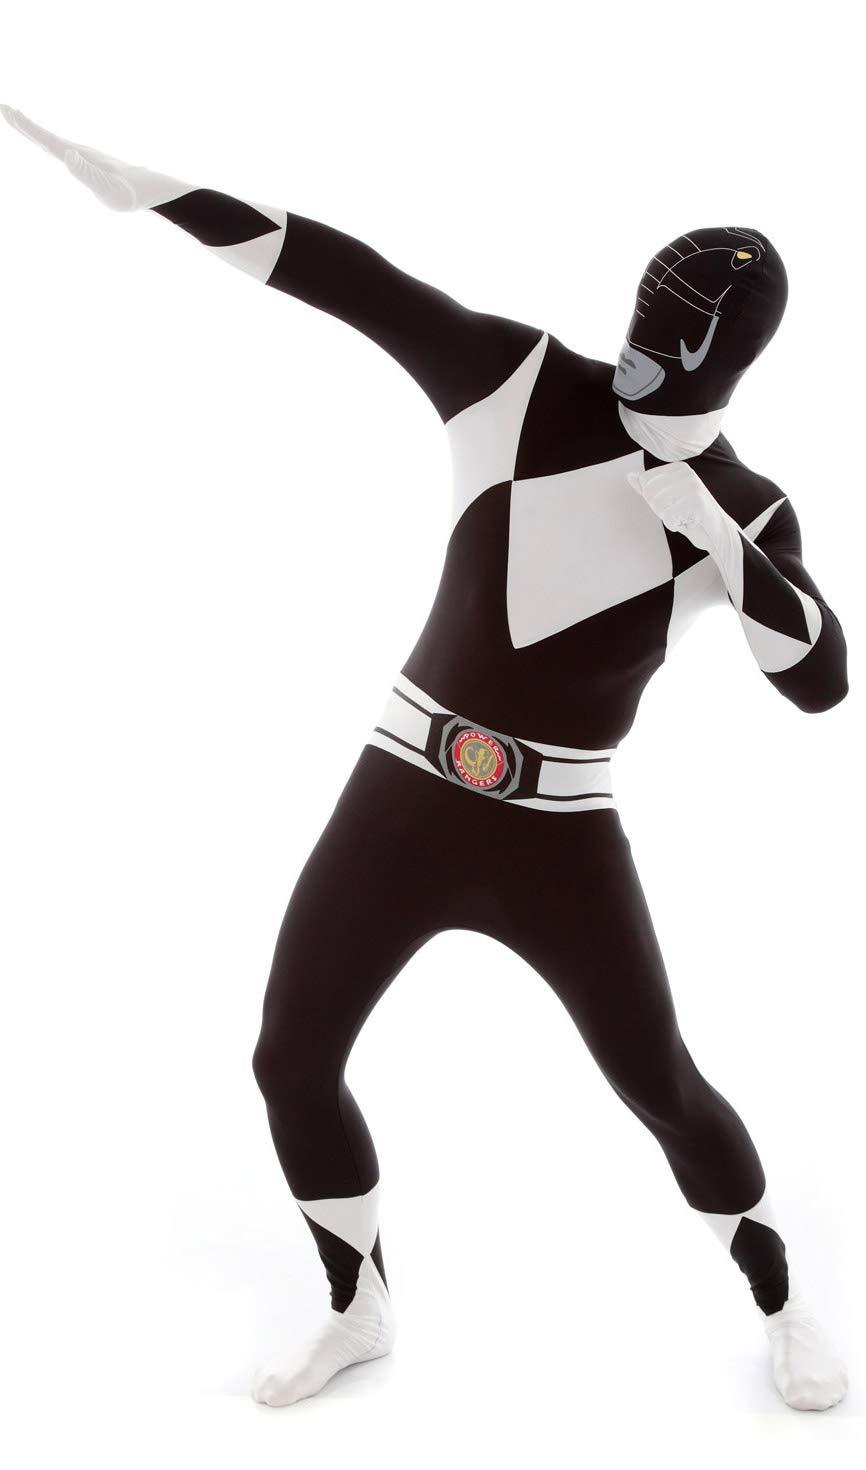 KULTFAKTOR GmbH Power Rangers Morphsuit Lizenzware schwarz-Weiss schwarz-Weiss schwarz-Weiss L (bis zu 1,80 m) 1b1fd8